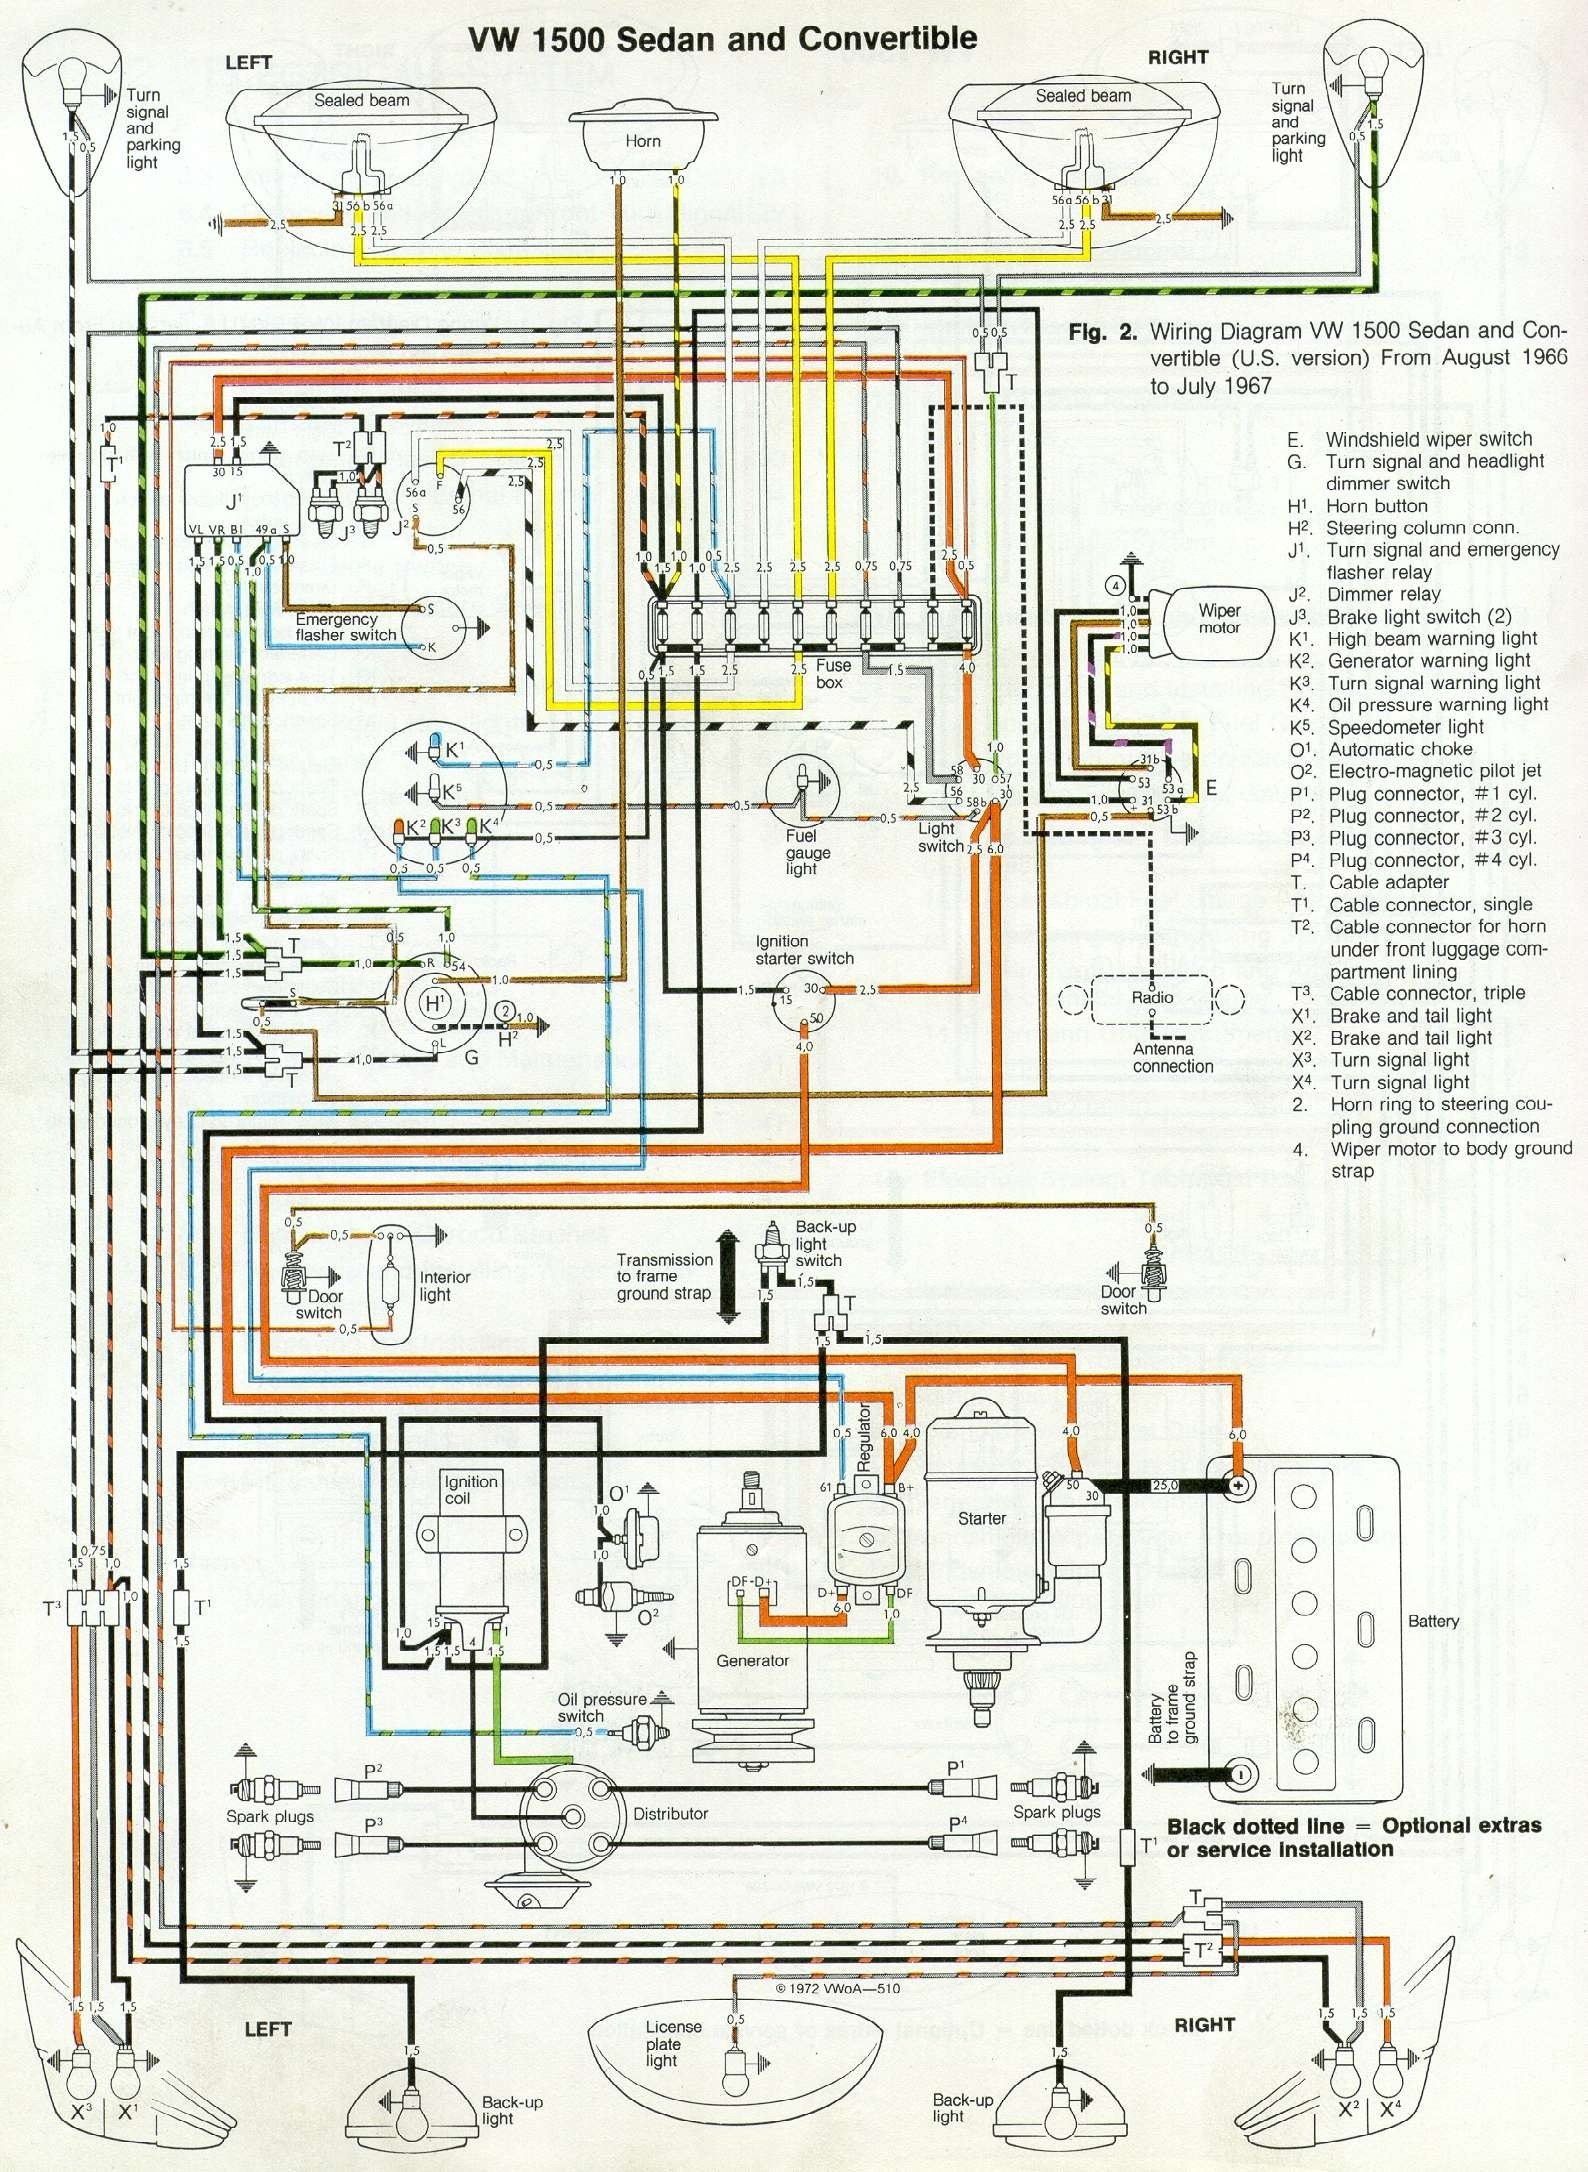 [FPWZ_2684]  Vw Bug Wiring Harness 1999 92 Honda Civic Wiring Diagram -  carh.95ri.the-rocks.it | Vw Bug Wire Harness |  | Bege Wiring Diagram Source Full Edition